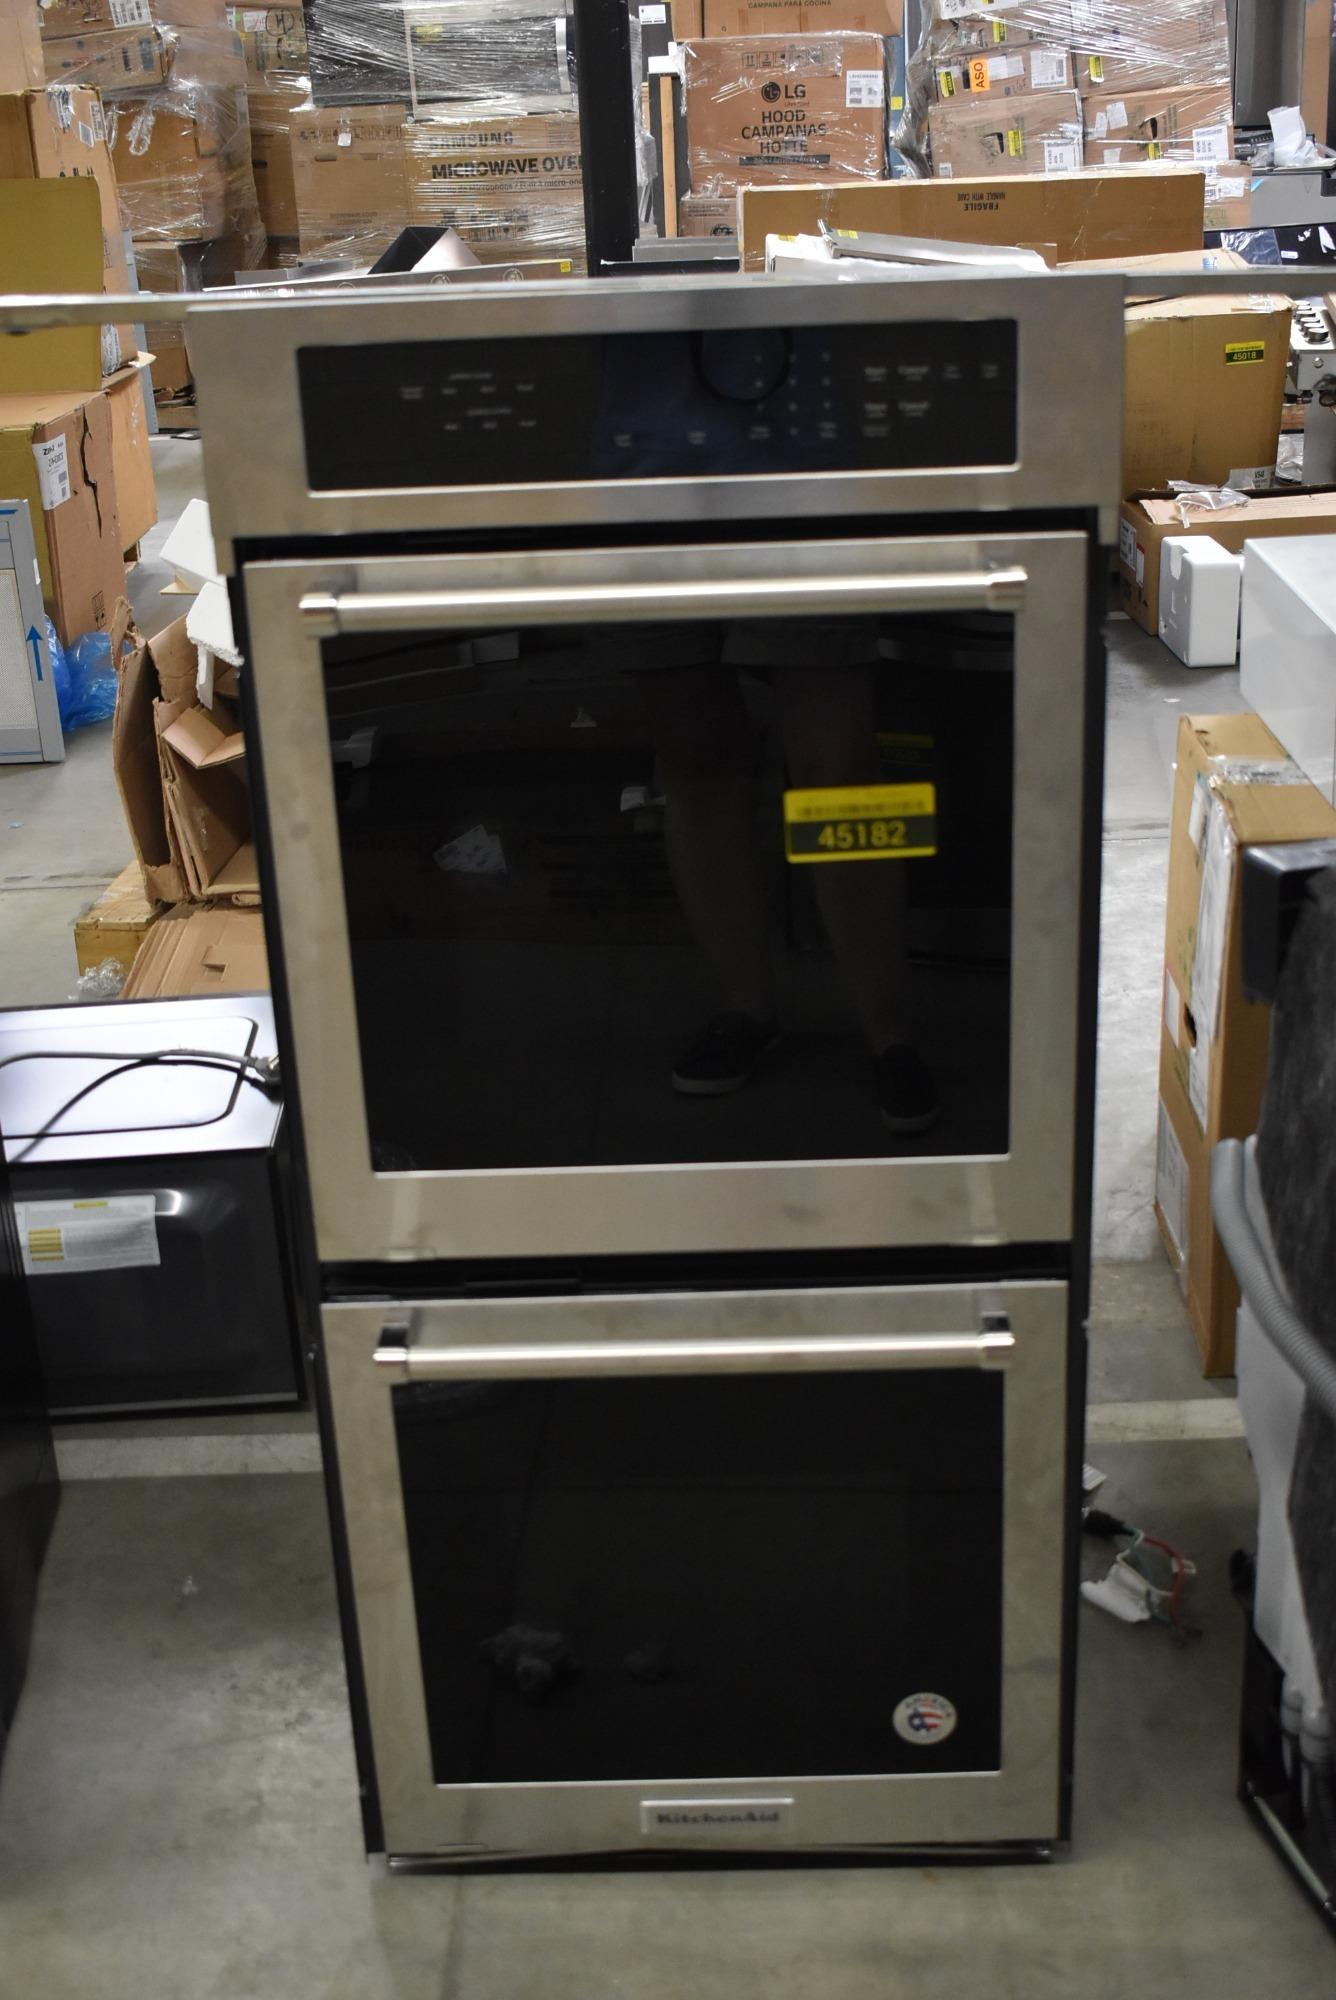 KitchenAid KODC304ESS 24